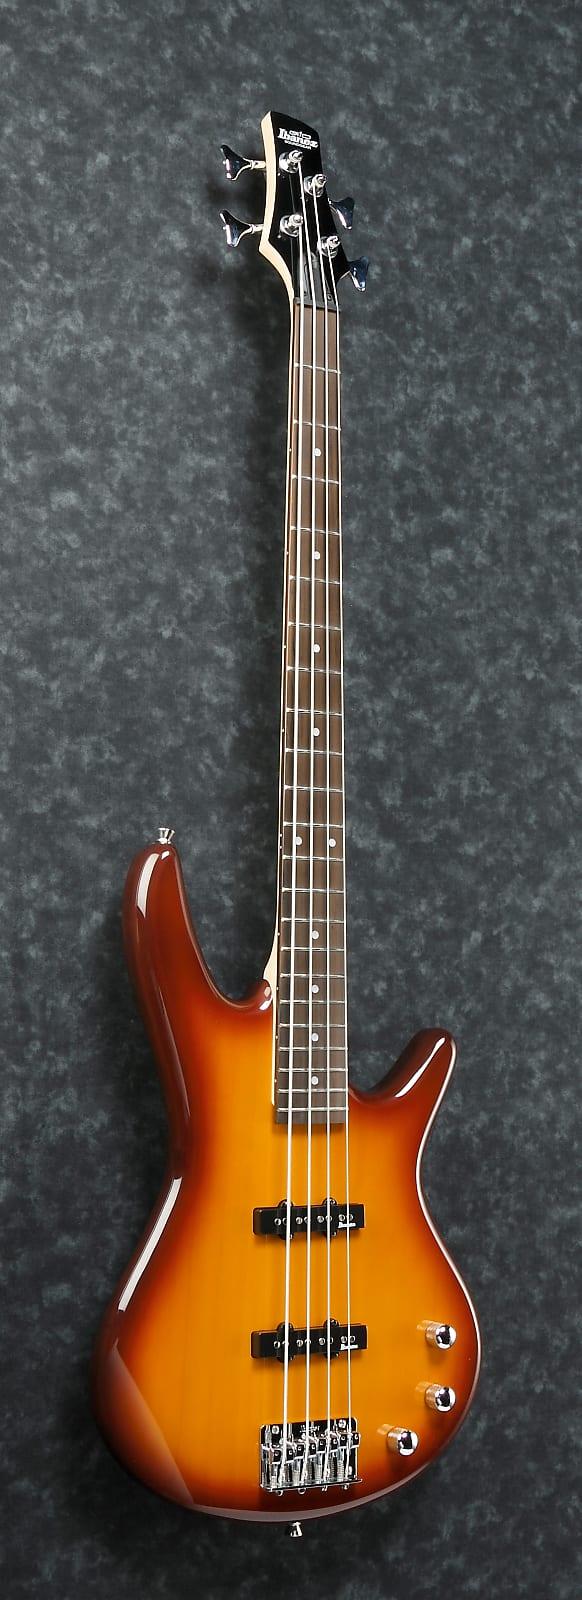 Ibanez GSR180-BS GIO Series E-Bass 4 String Brown Sunburst